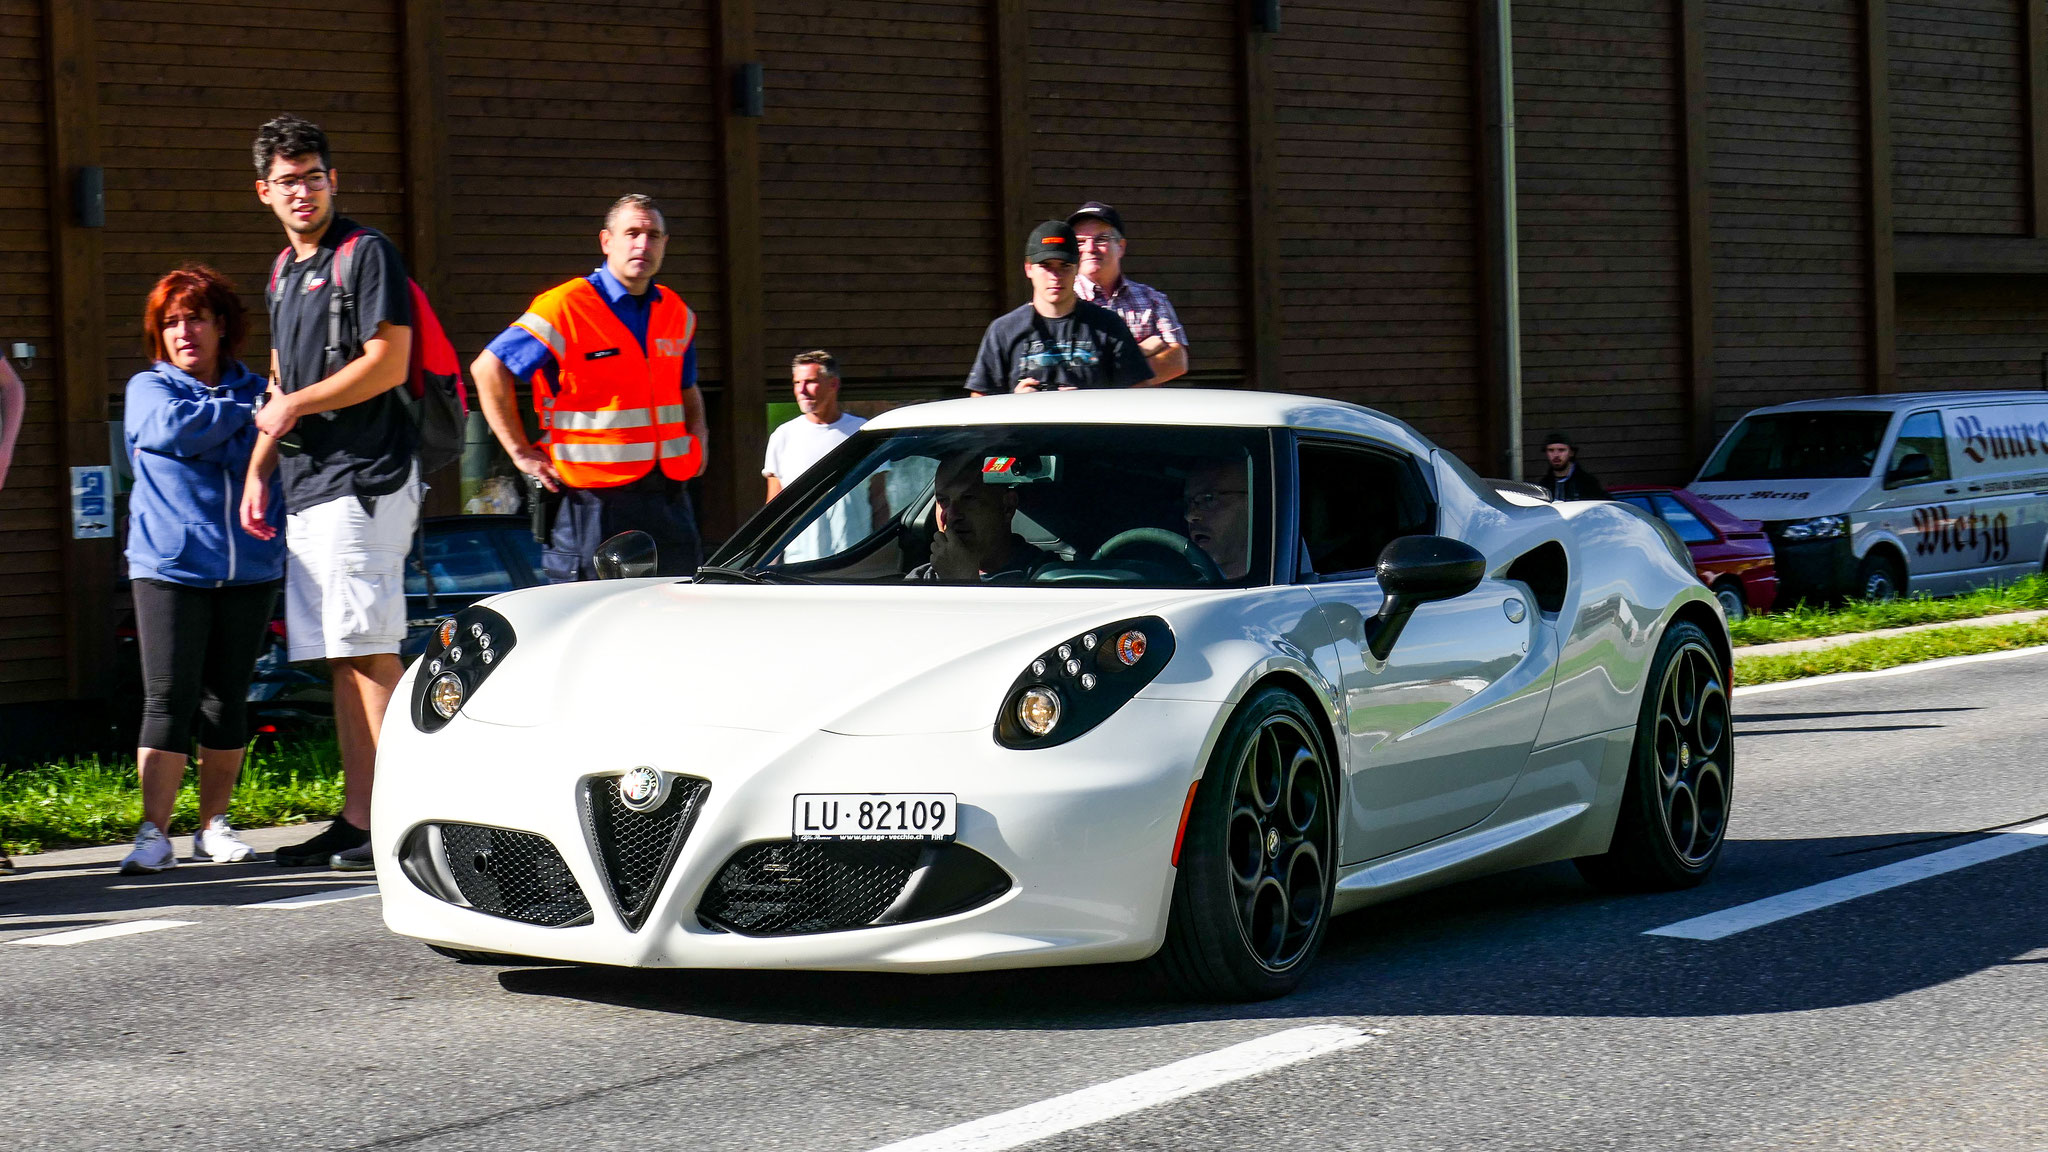 Alfa Romeo 4C - LU-82109 (CH)